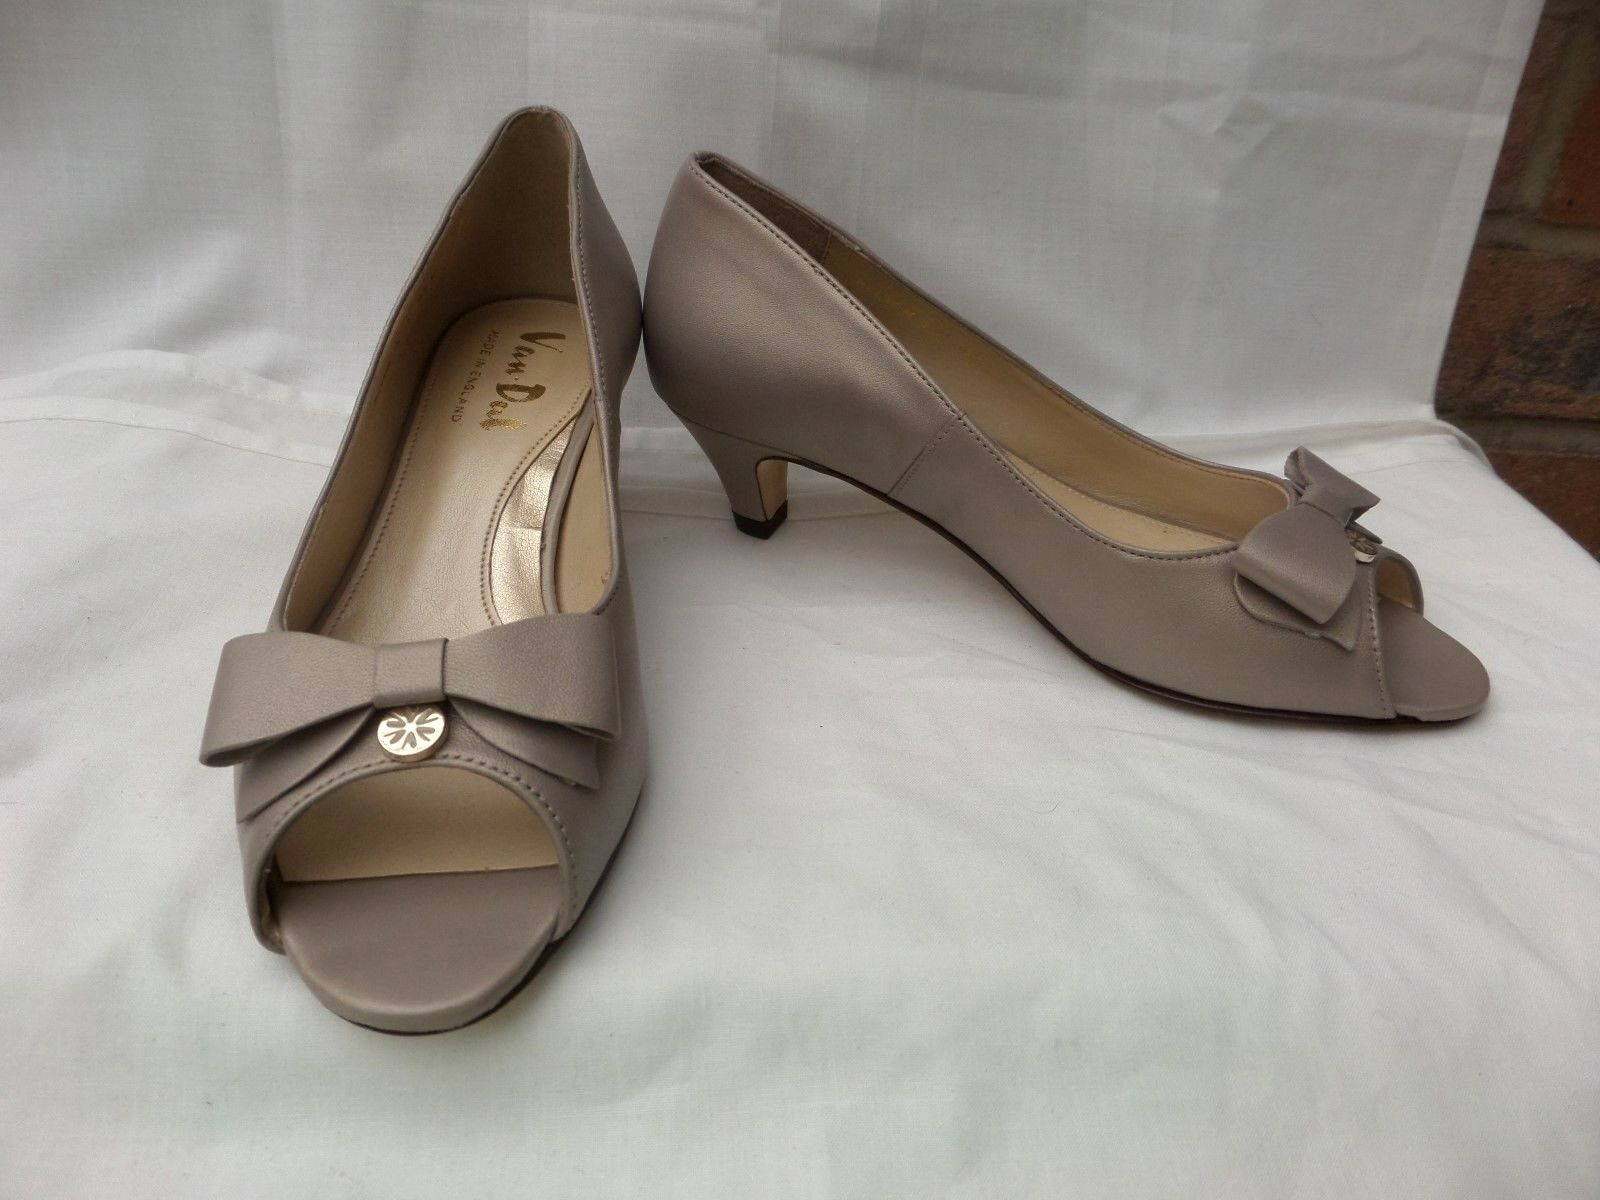 "VAN DAL Belton UK 3 / 36 Almond Prisd Beige leather court shoes  2"" heels New"